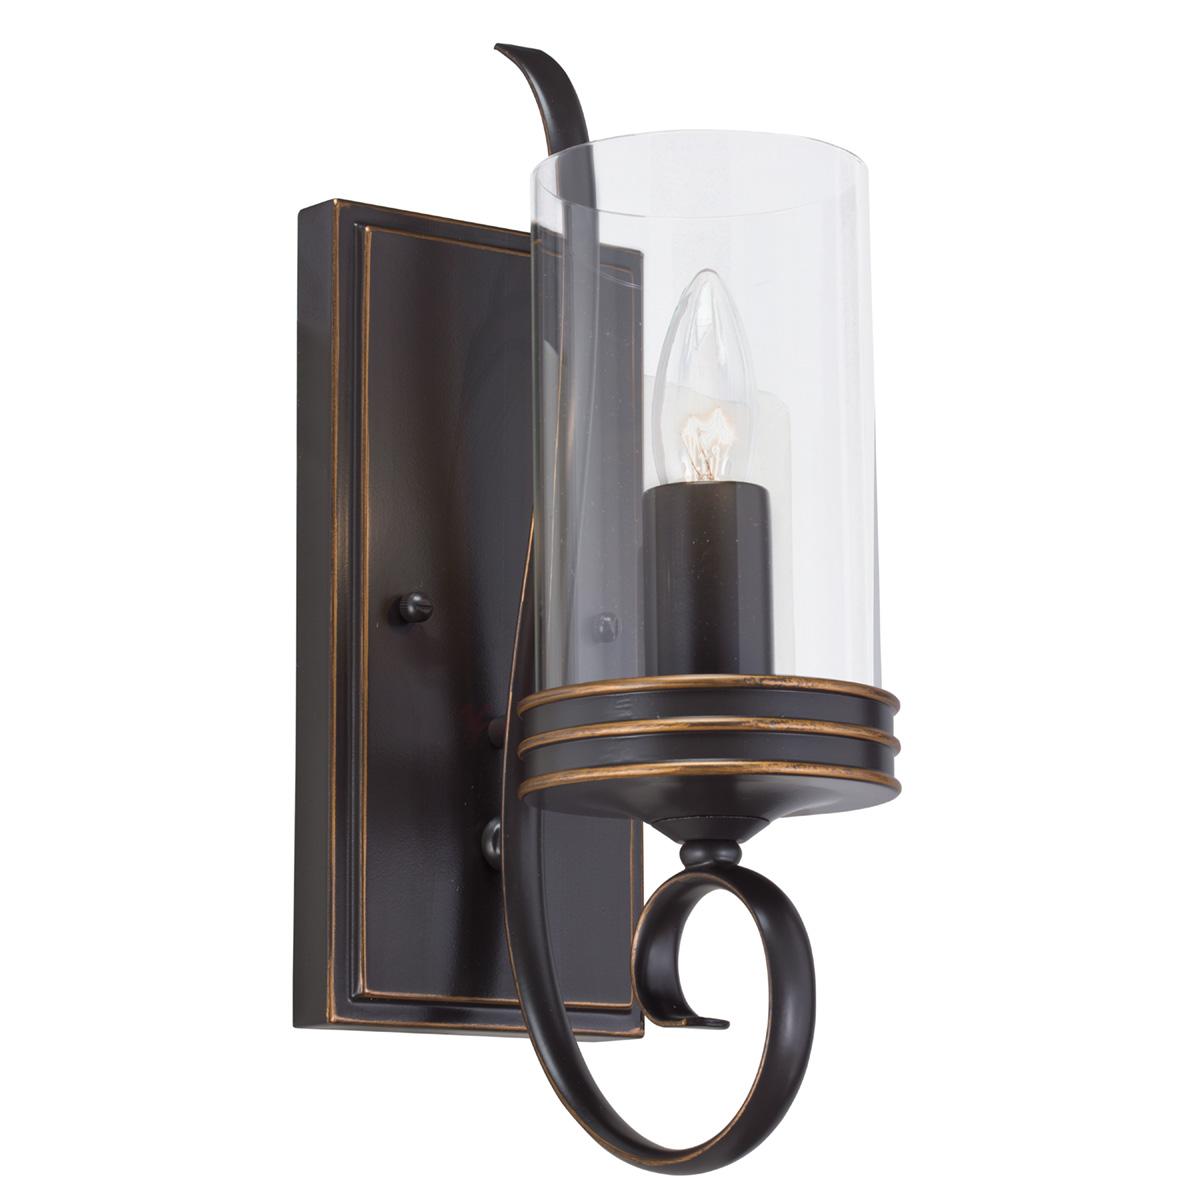 Diana 1 Light Wall Sconce Olde Bronze® | Kichler Lighting on Kichler Olde Bronze Wall Sconce id=94043